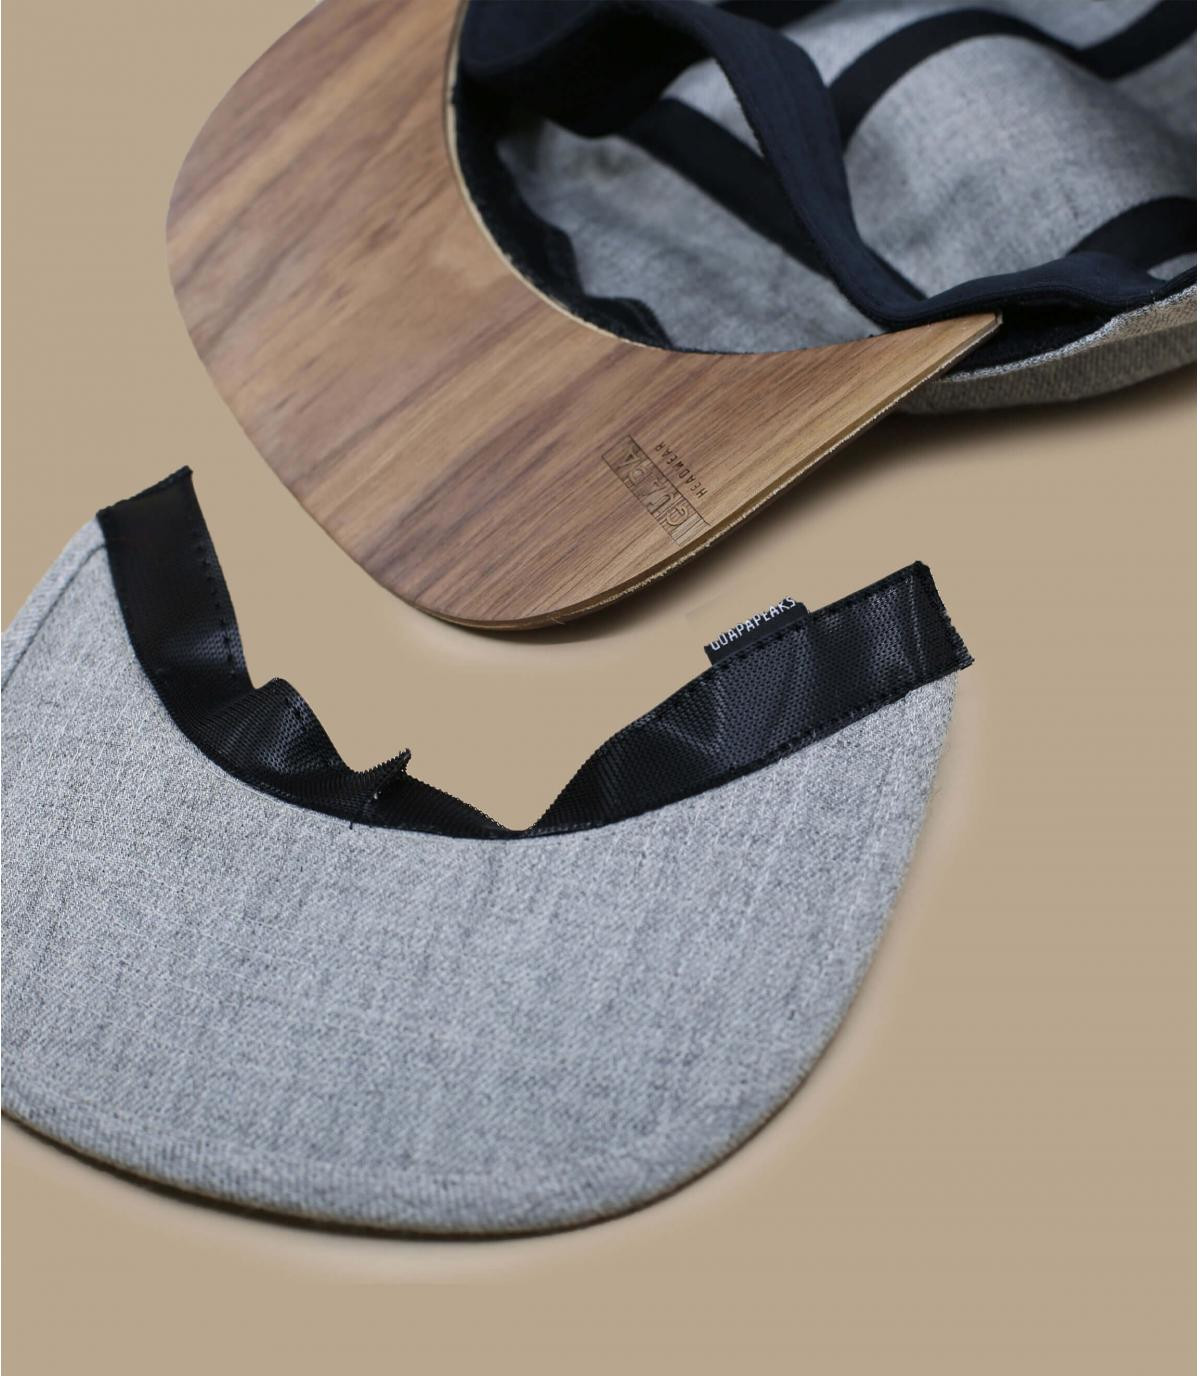 Details 5Panel Recycled heather grey - Abbildung 5